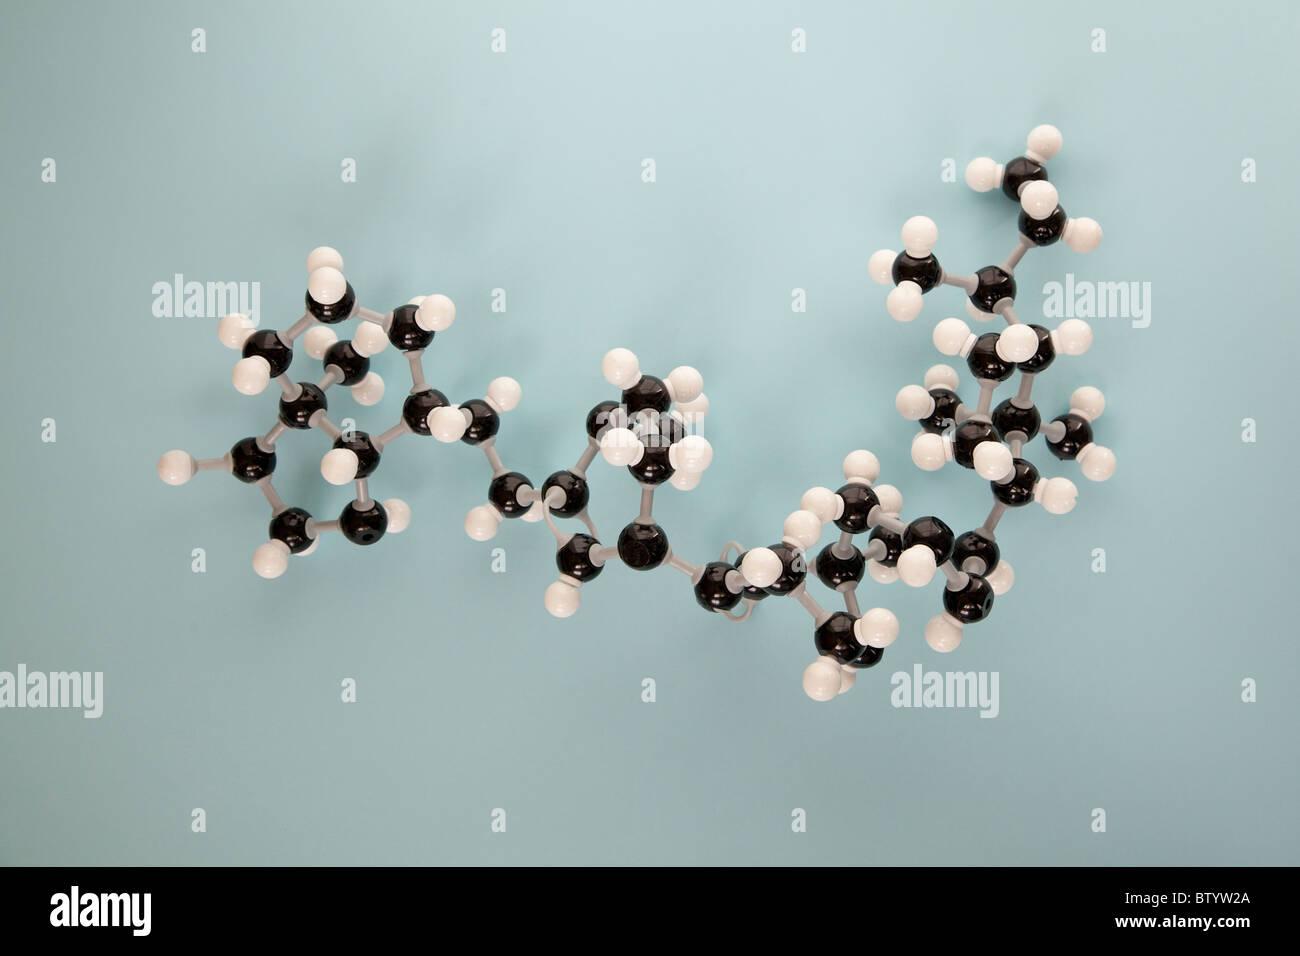 molecule - Stock Image